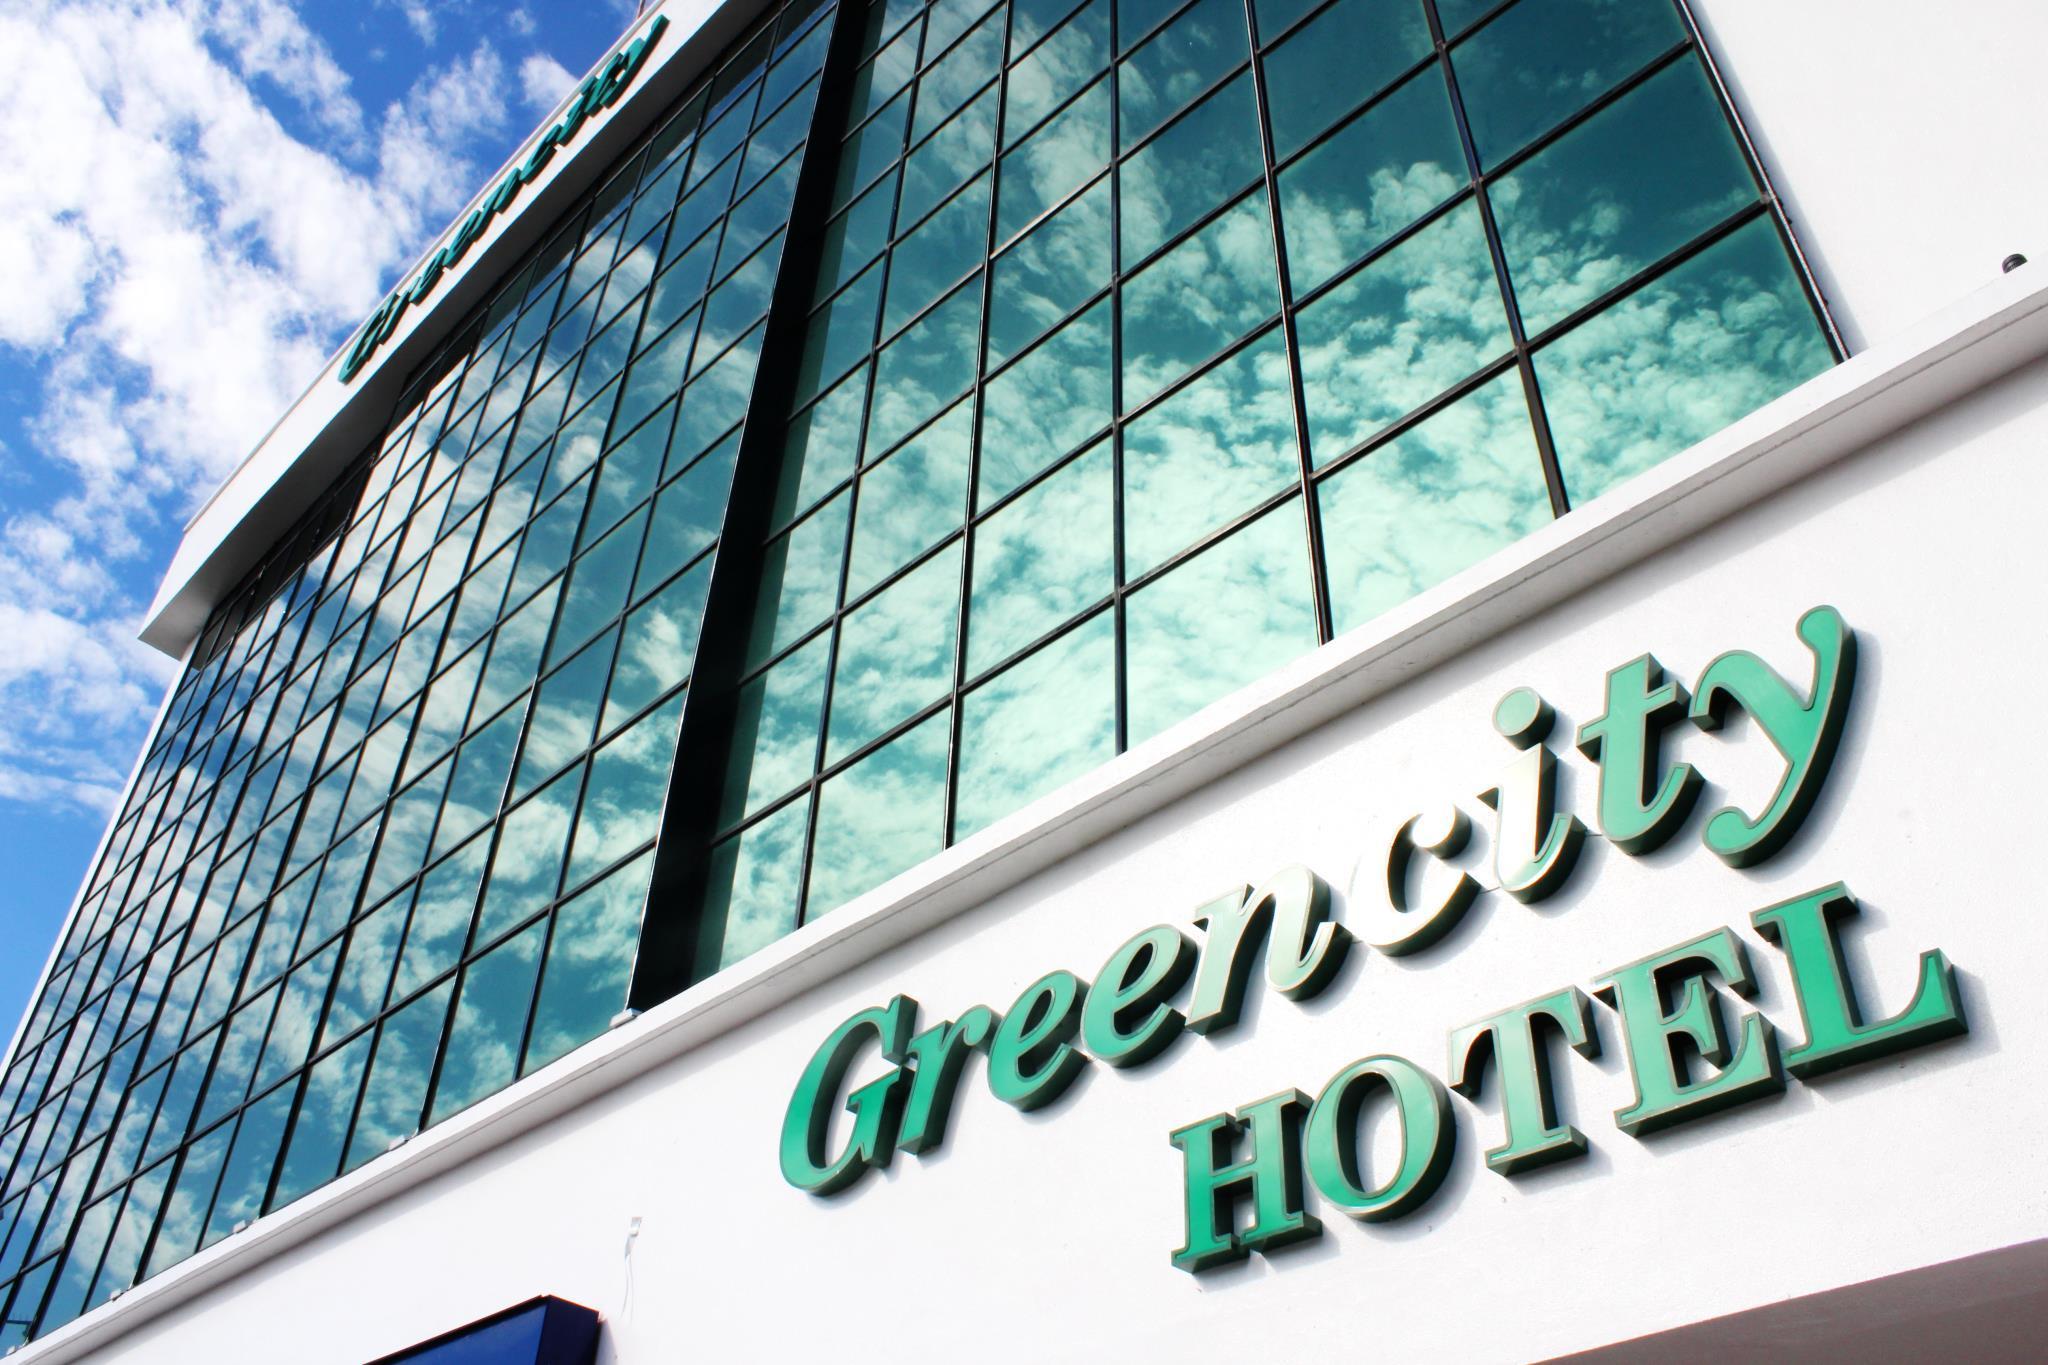 Greencity Hotel, Kuala Muda